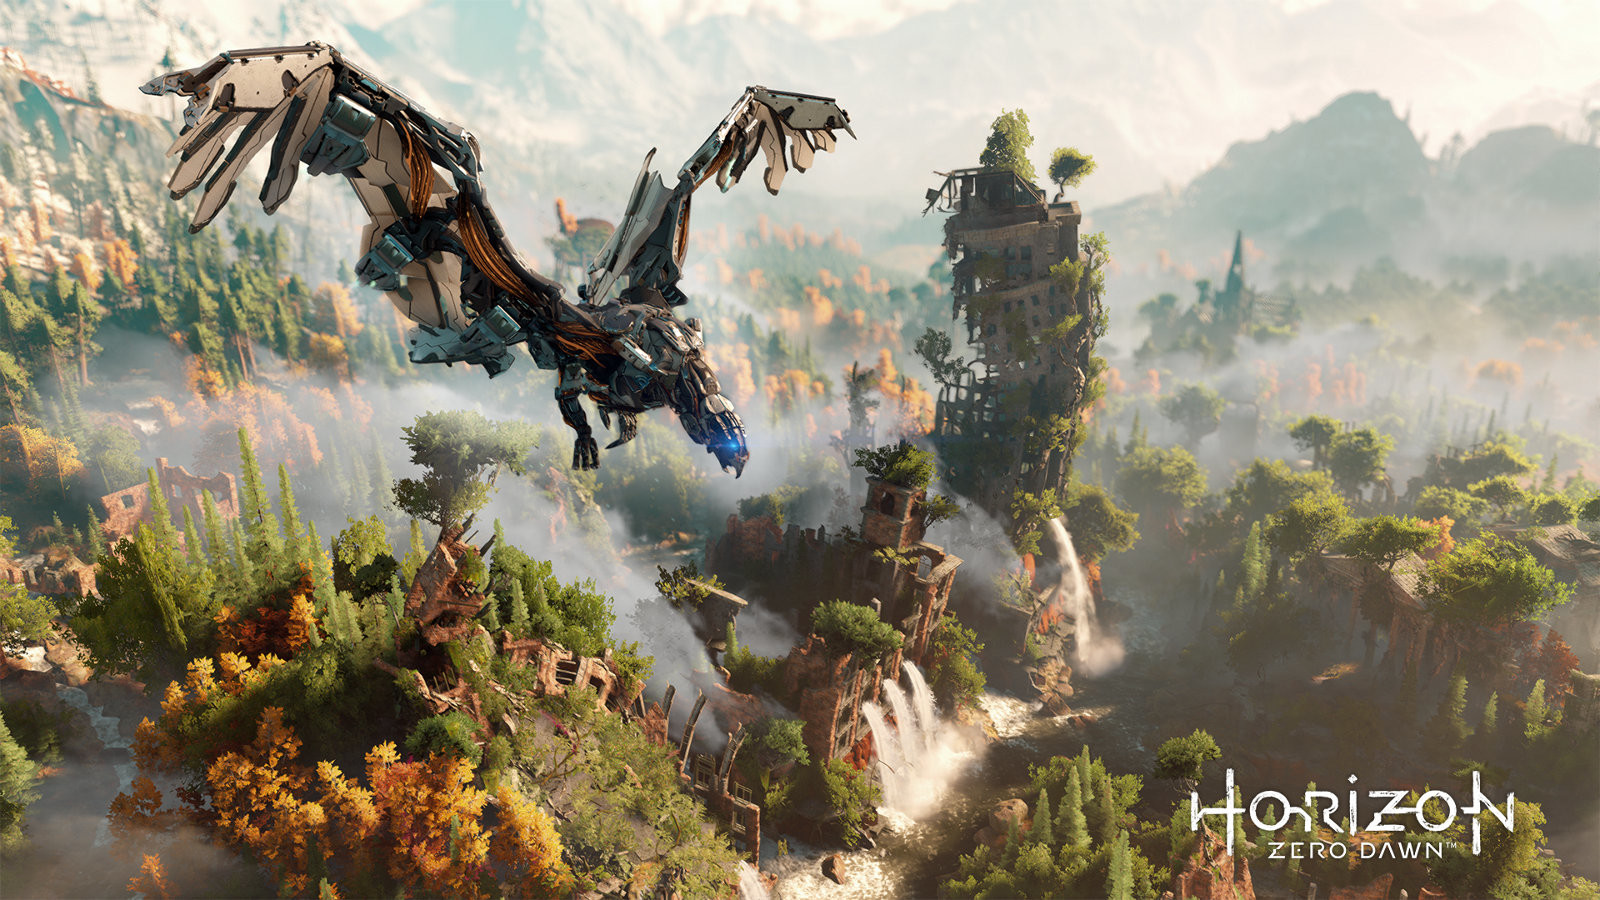 Guerrilla Games Announces Horizon Zero Dawn Is Coming To Steam